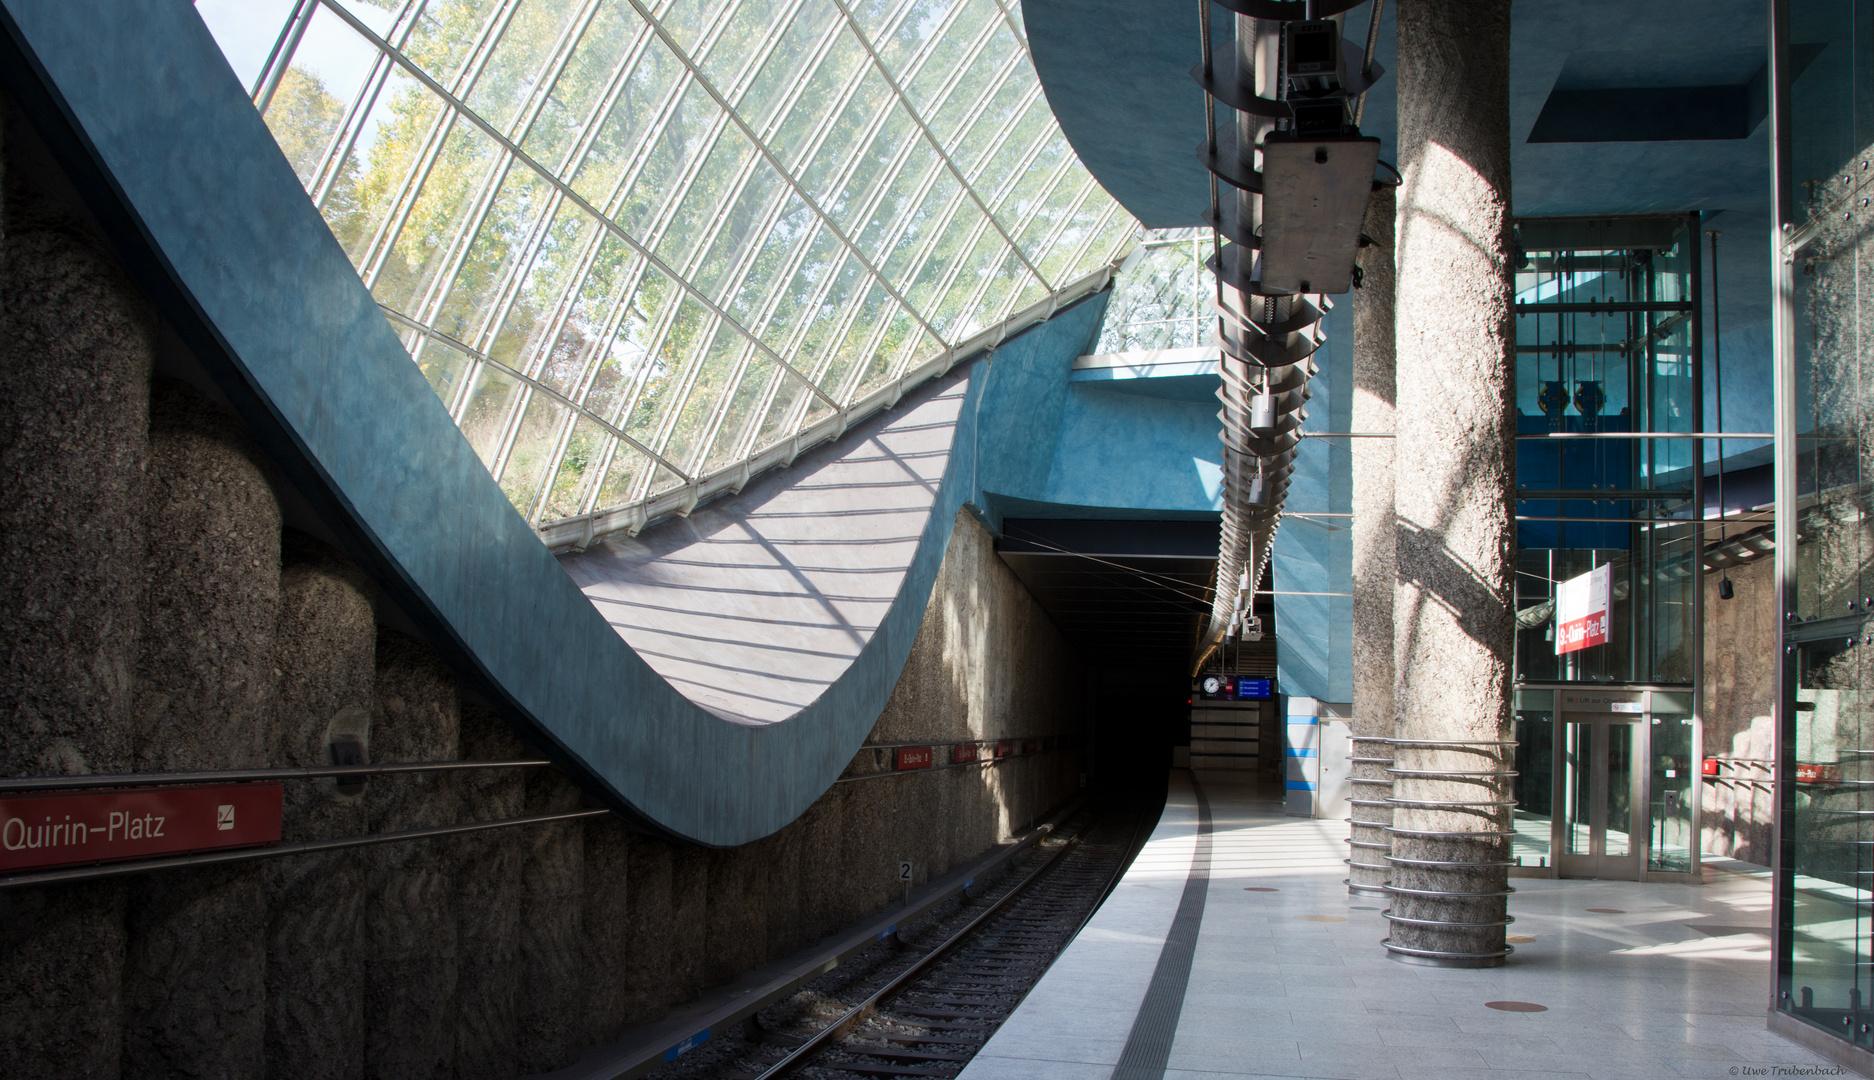 U-Bahnhof St.-Quirin-Platz (4)